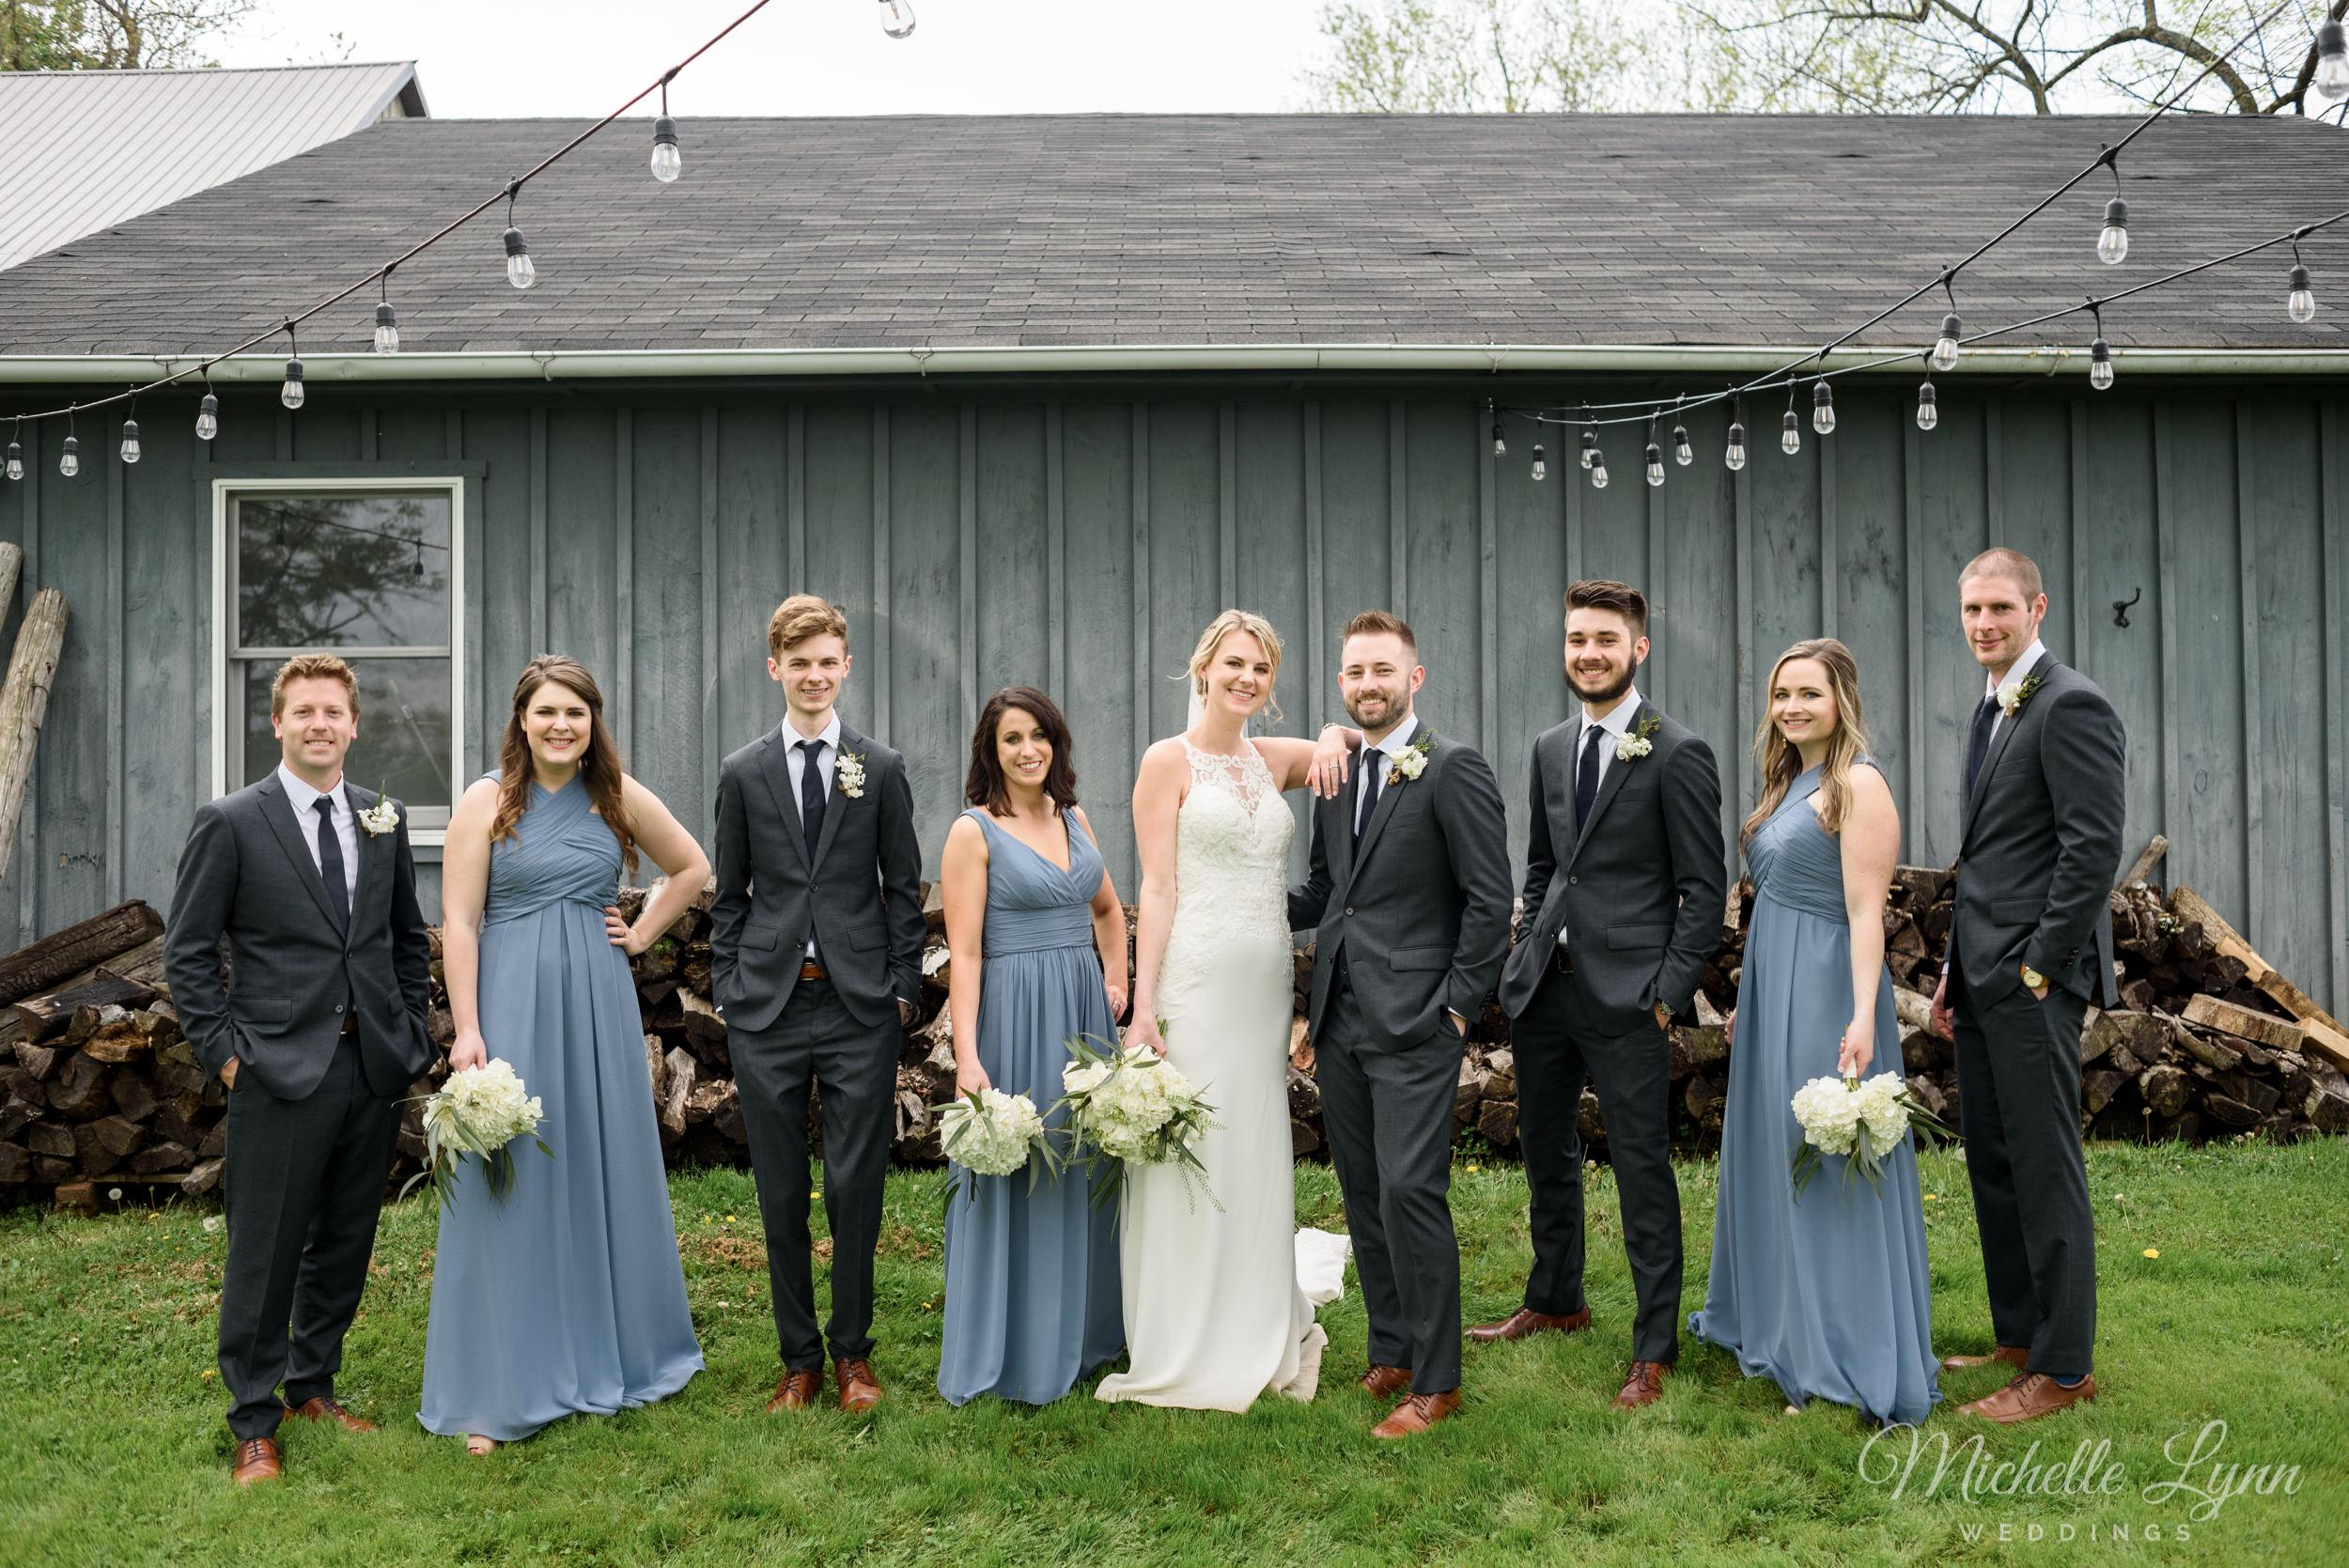 mlw-the-farm-bakery-and-events-wedding-photos-49.jpg